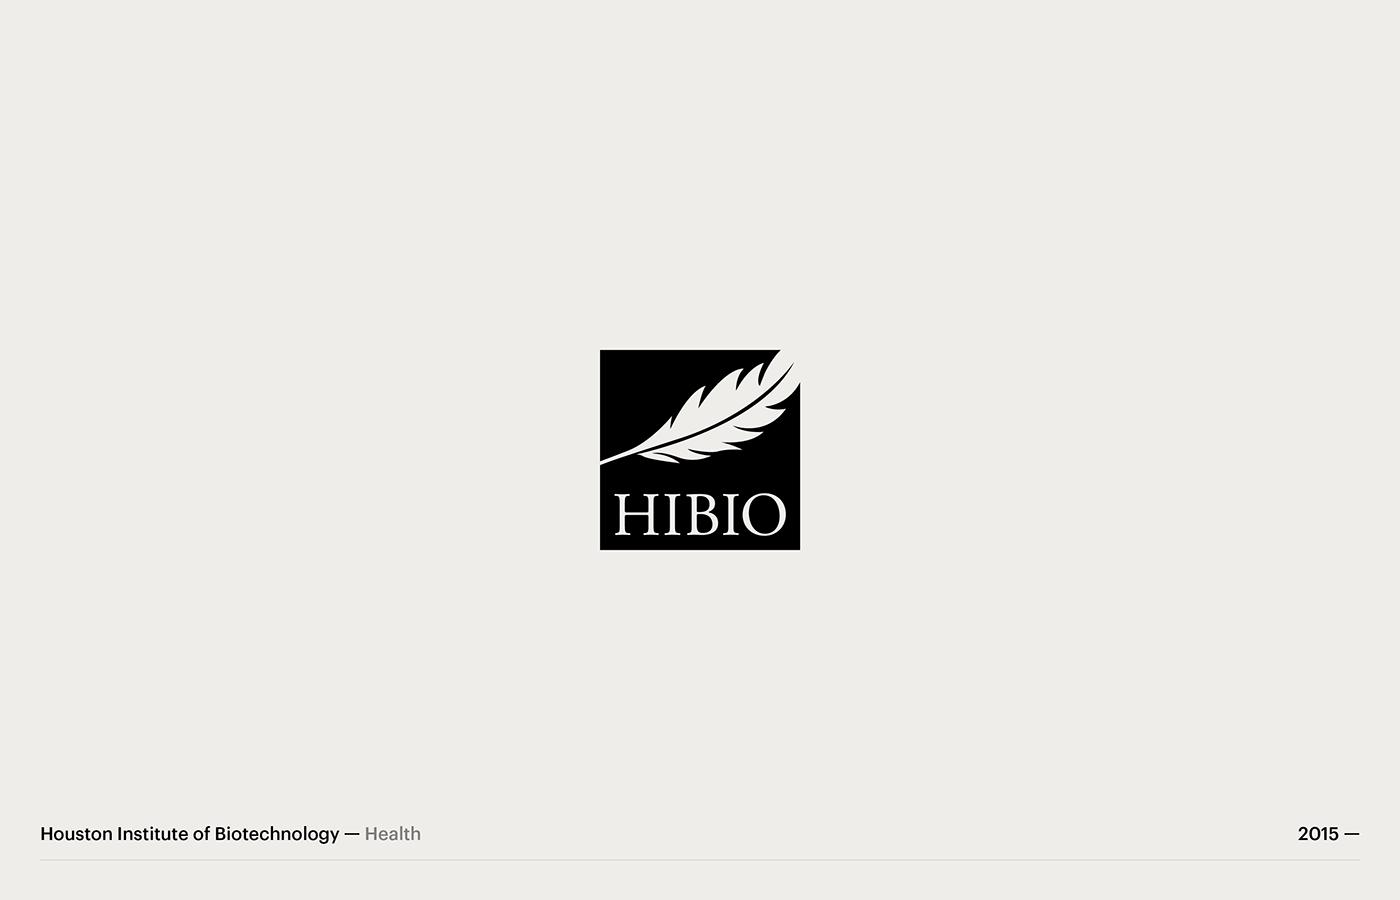 logo logos branding  design graphic ILLUSTRATION  Education Food  museum business